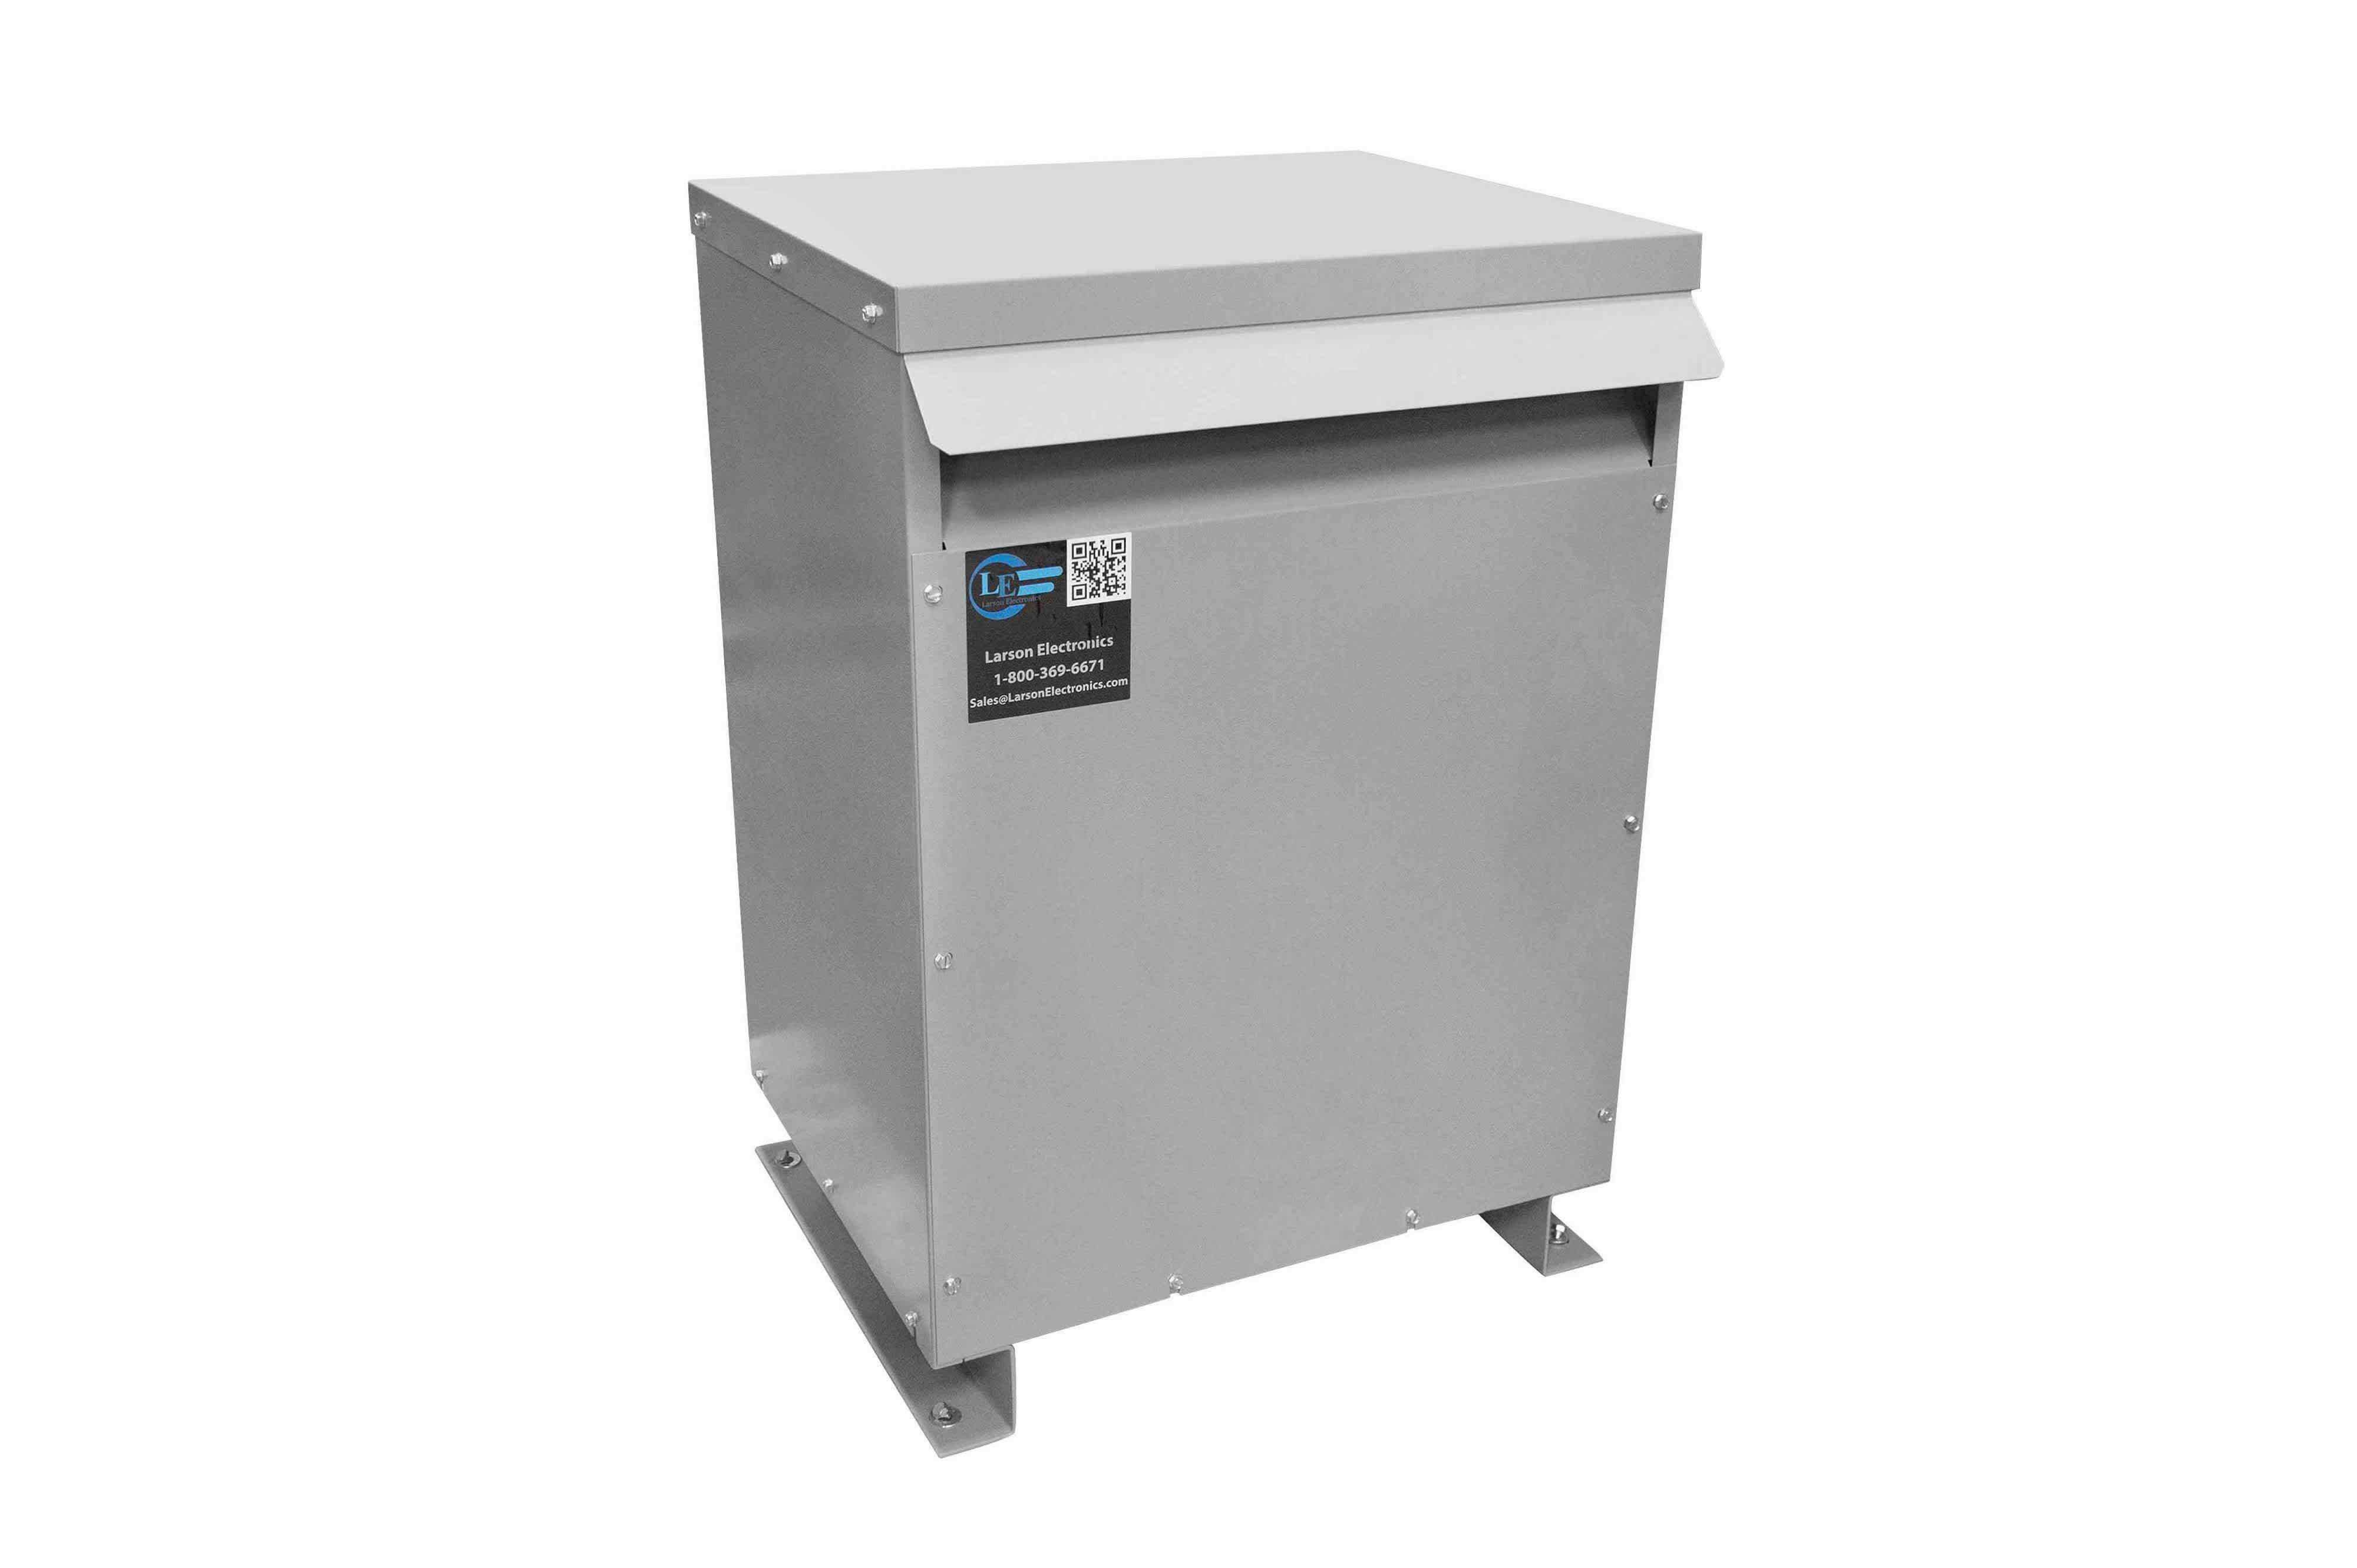 700 kVA 3PH Isolation Transformer, 415V Wye Primary, 208Y/120 Wye-N Secondary, N3R, Ventilated, 60 Hz